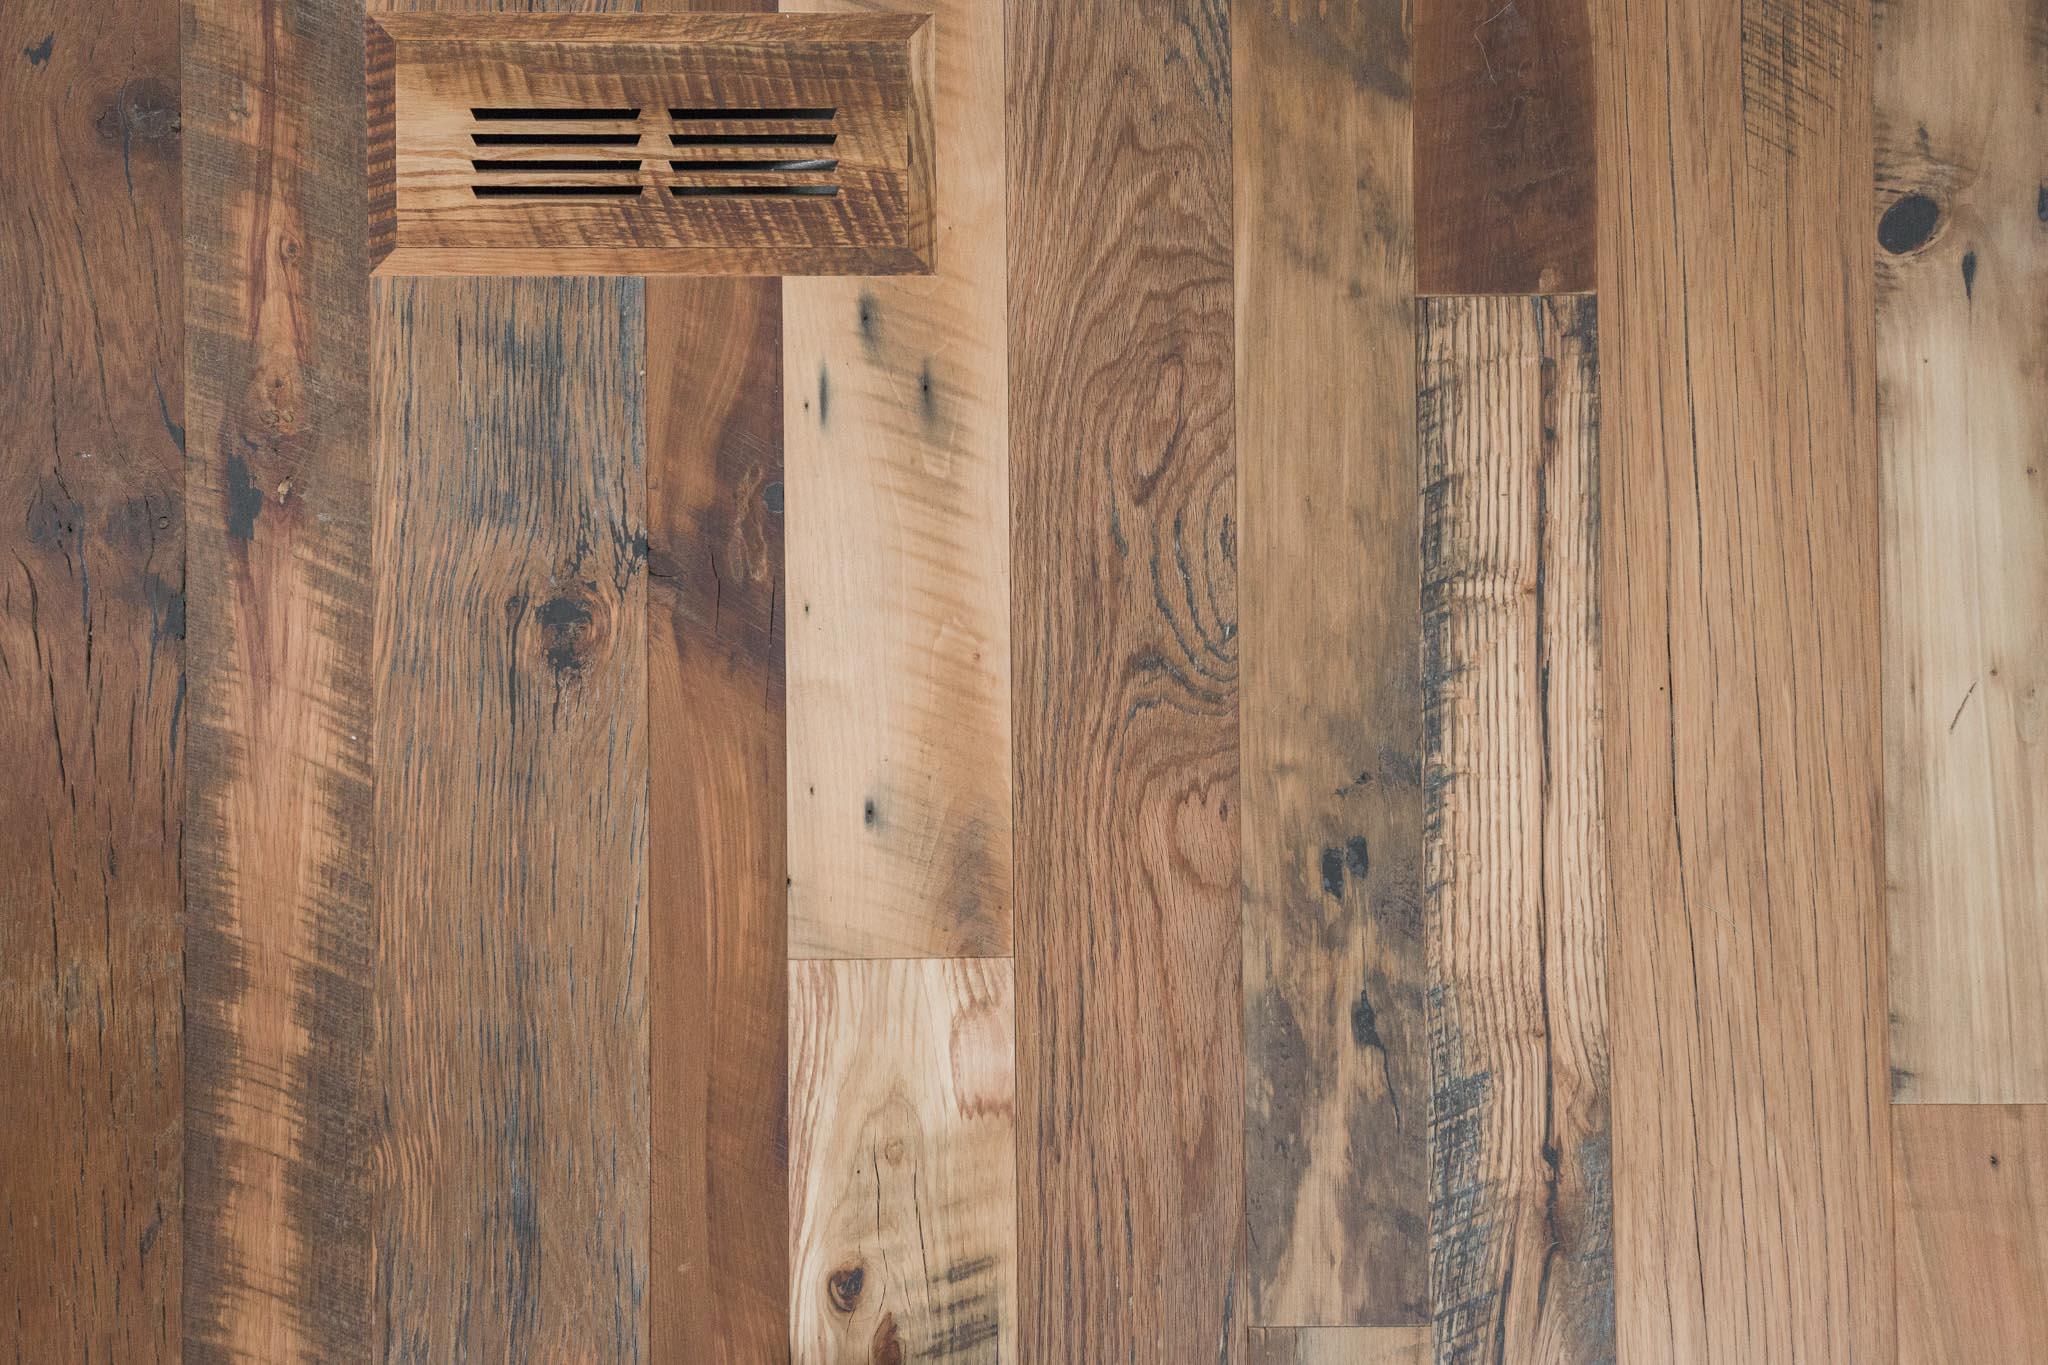 Web Res (For Social) Wabamun Cottage Floors-58.jpg